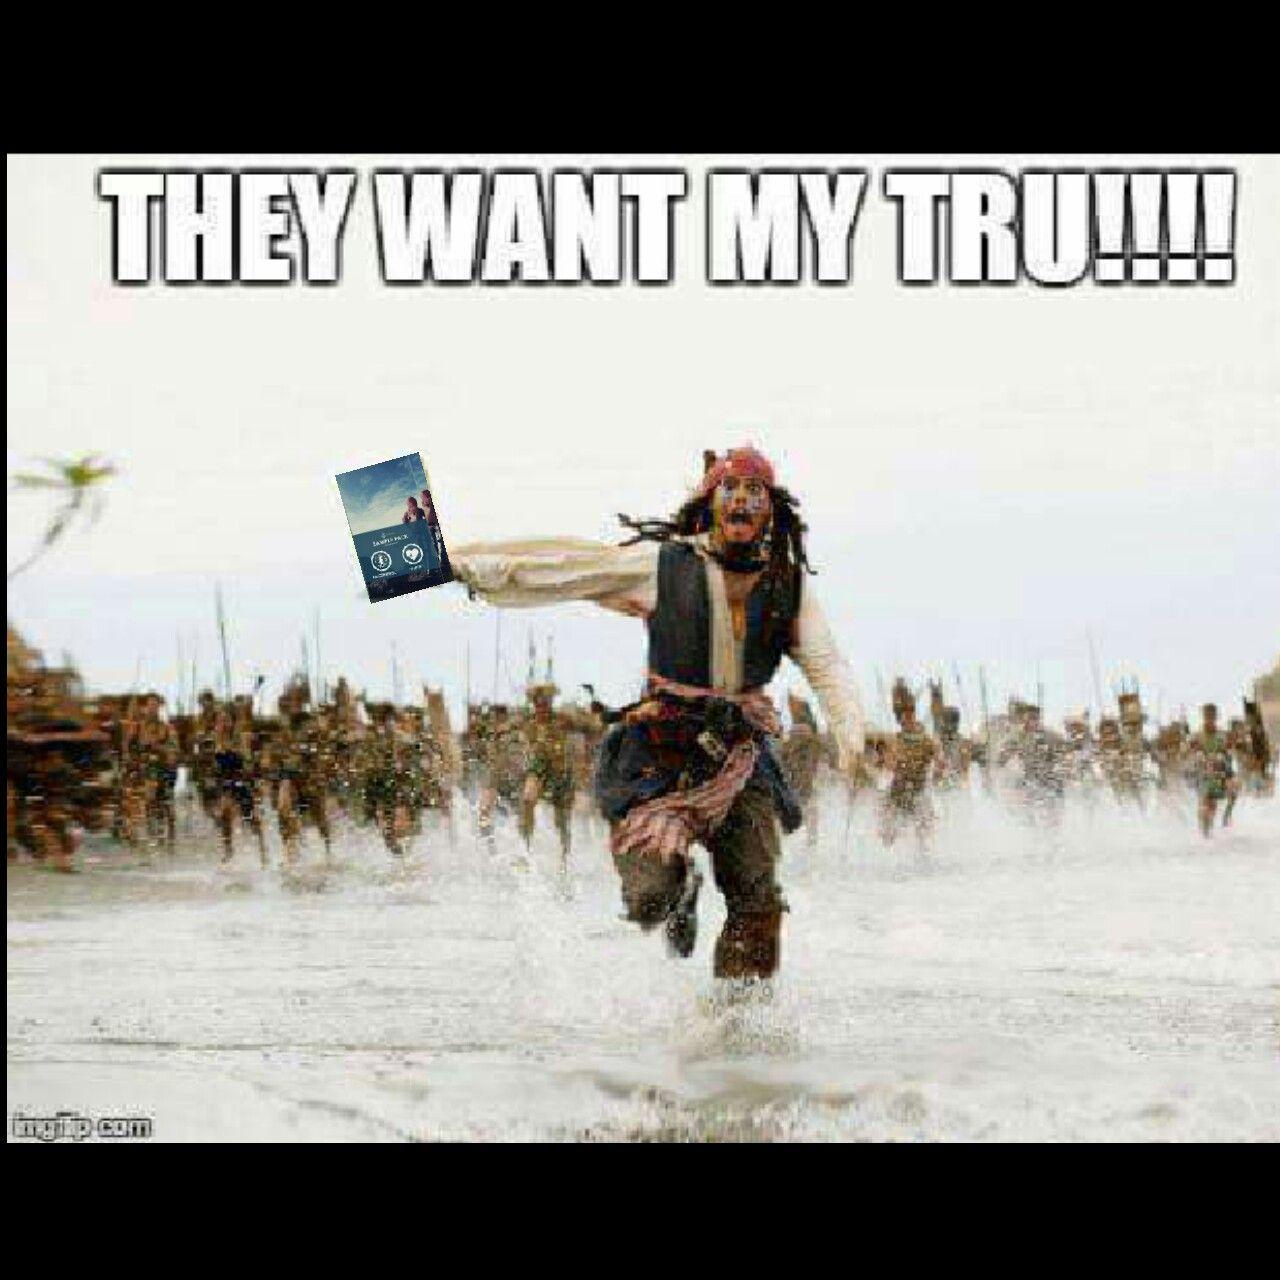 Everyone wants Truvision! Funny disney memes, Disney